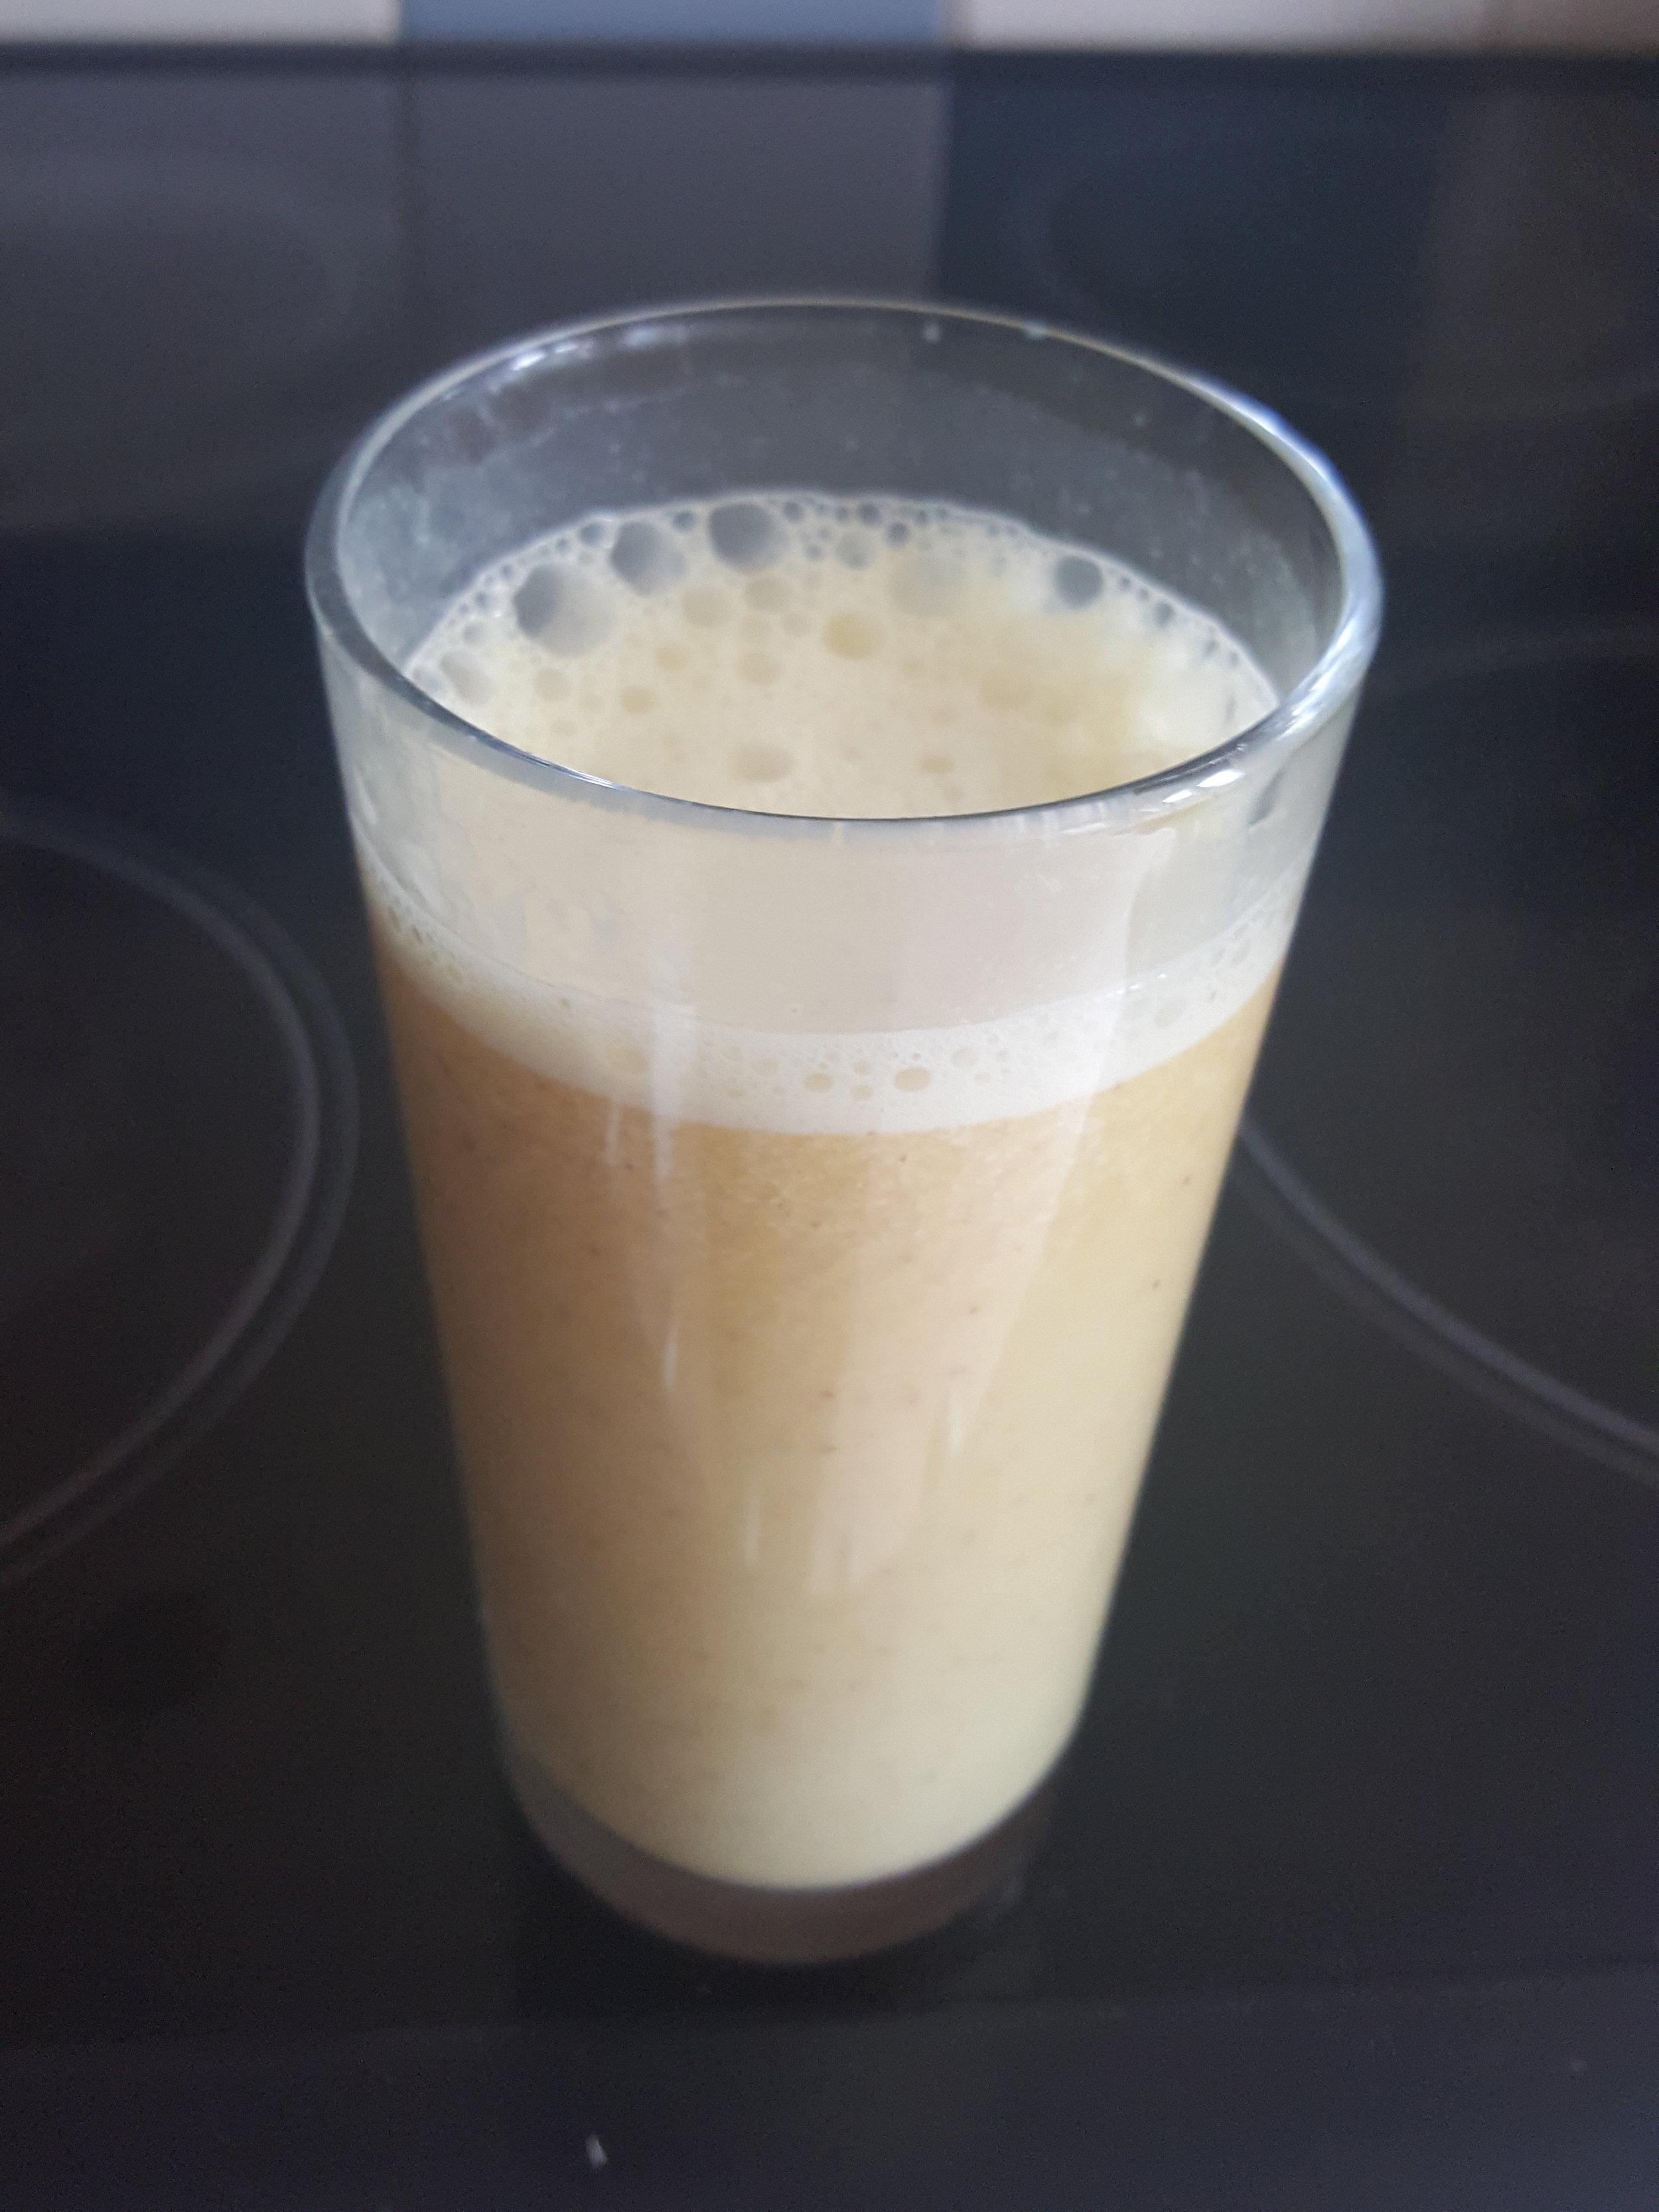 www.coreoflife.co.uk - Turmeric Drink